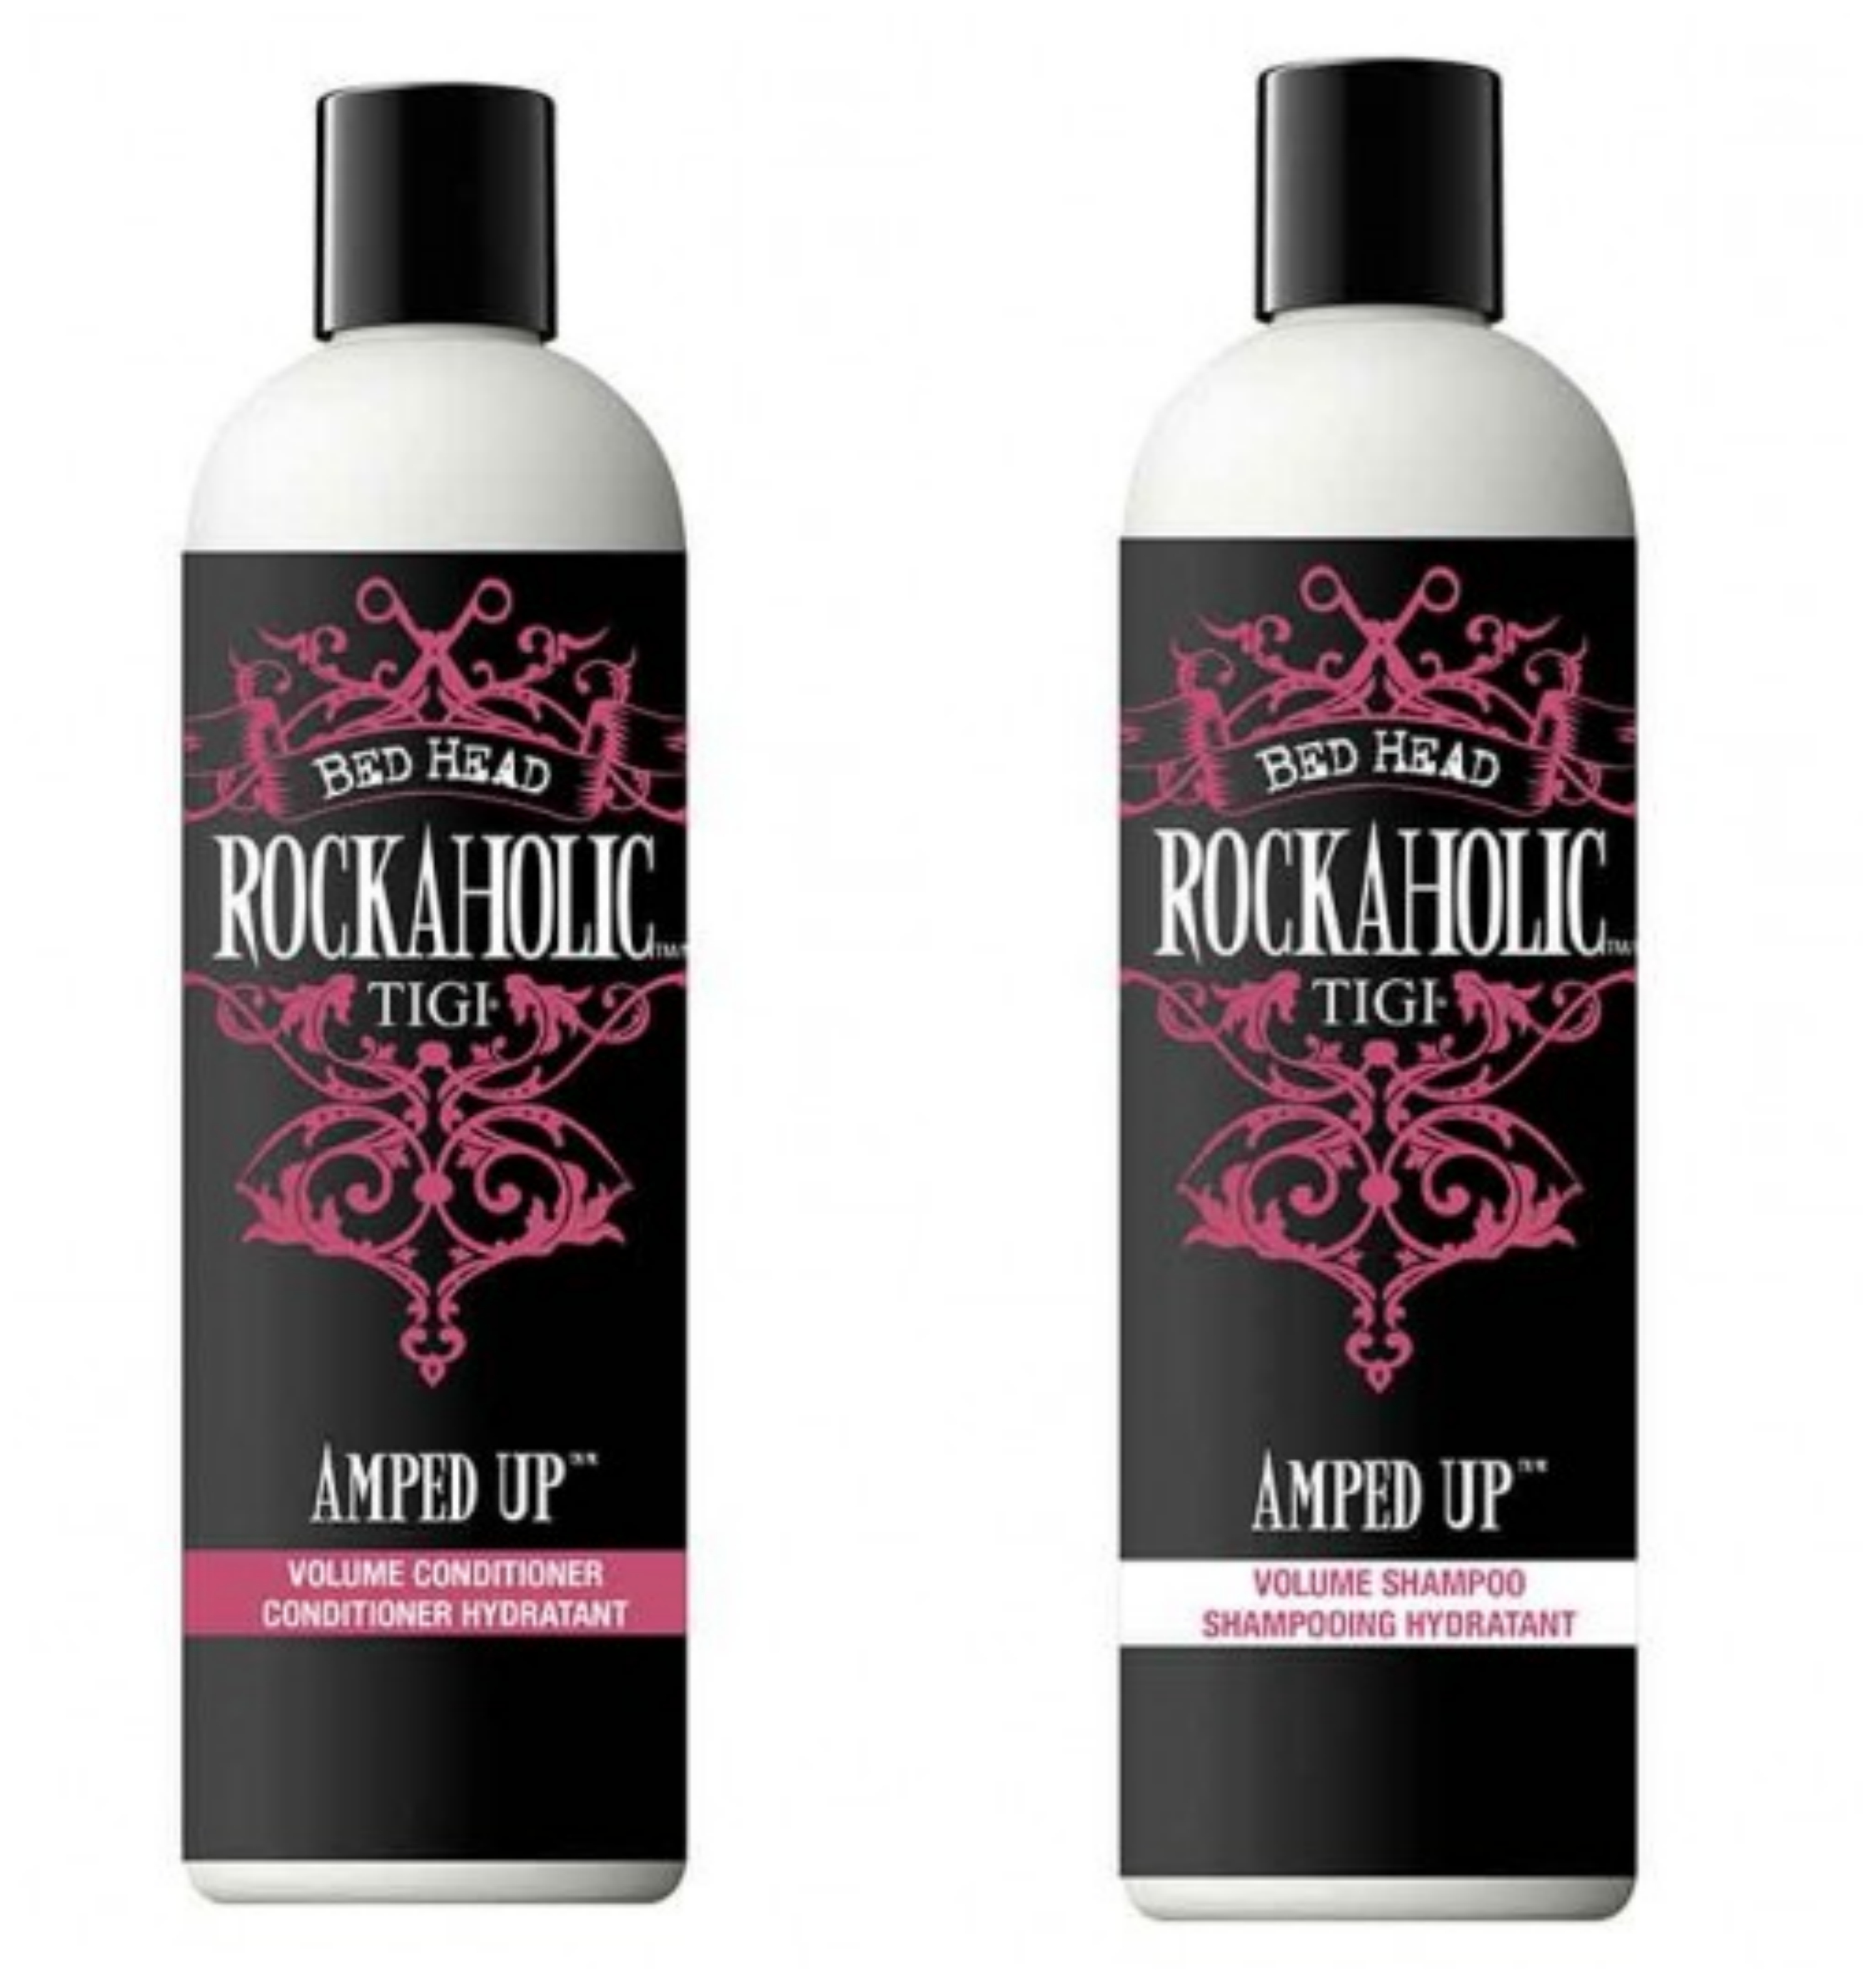 TIGI rockaholic shampoo and conditioner